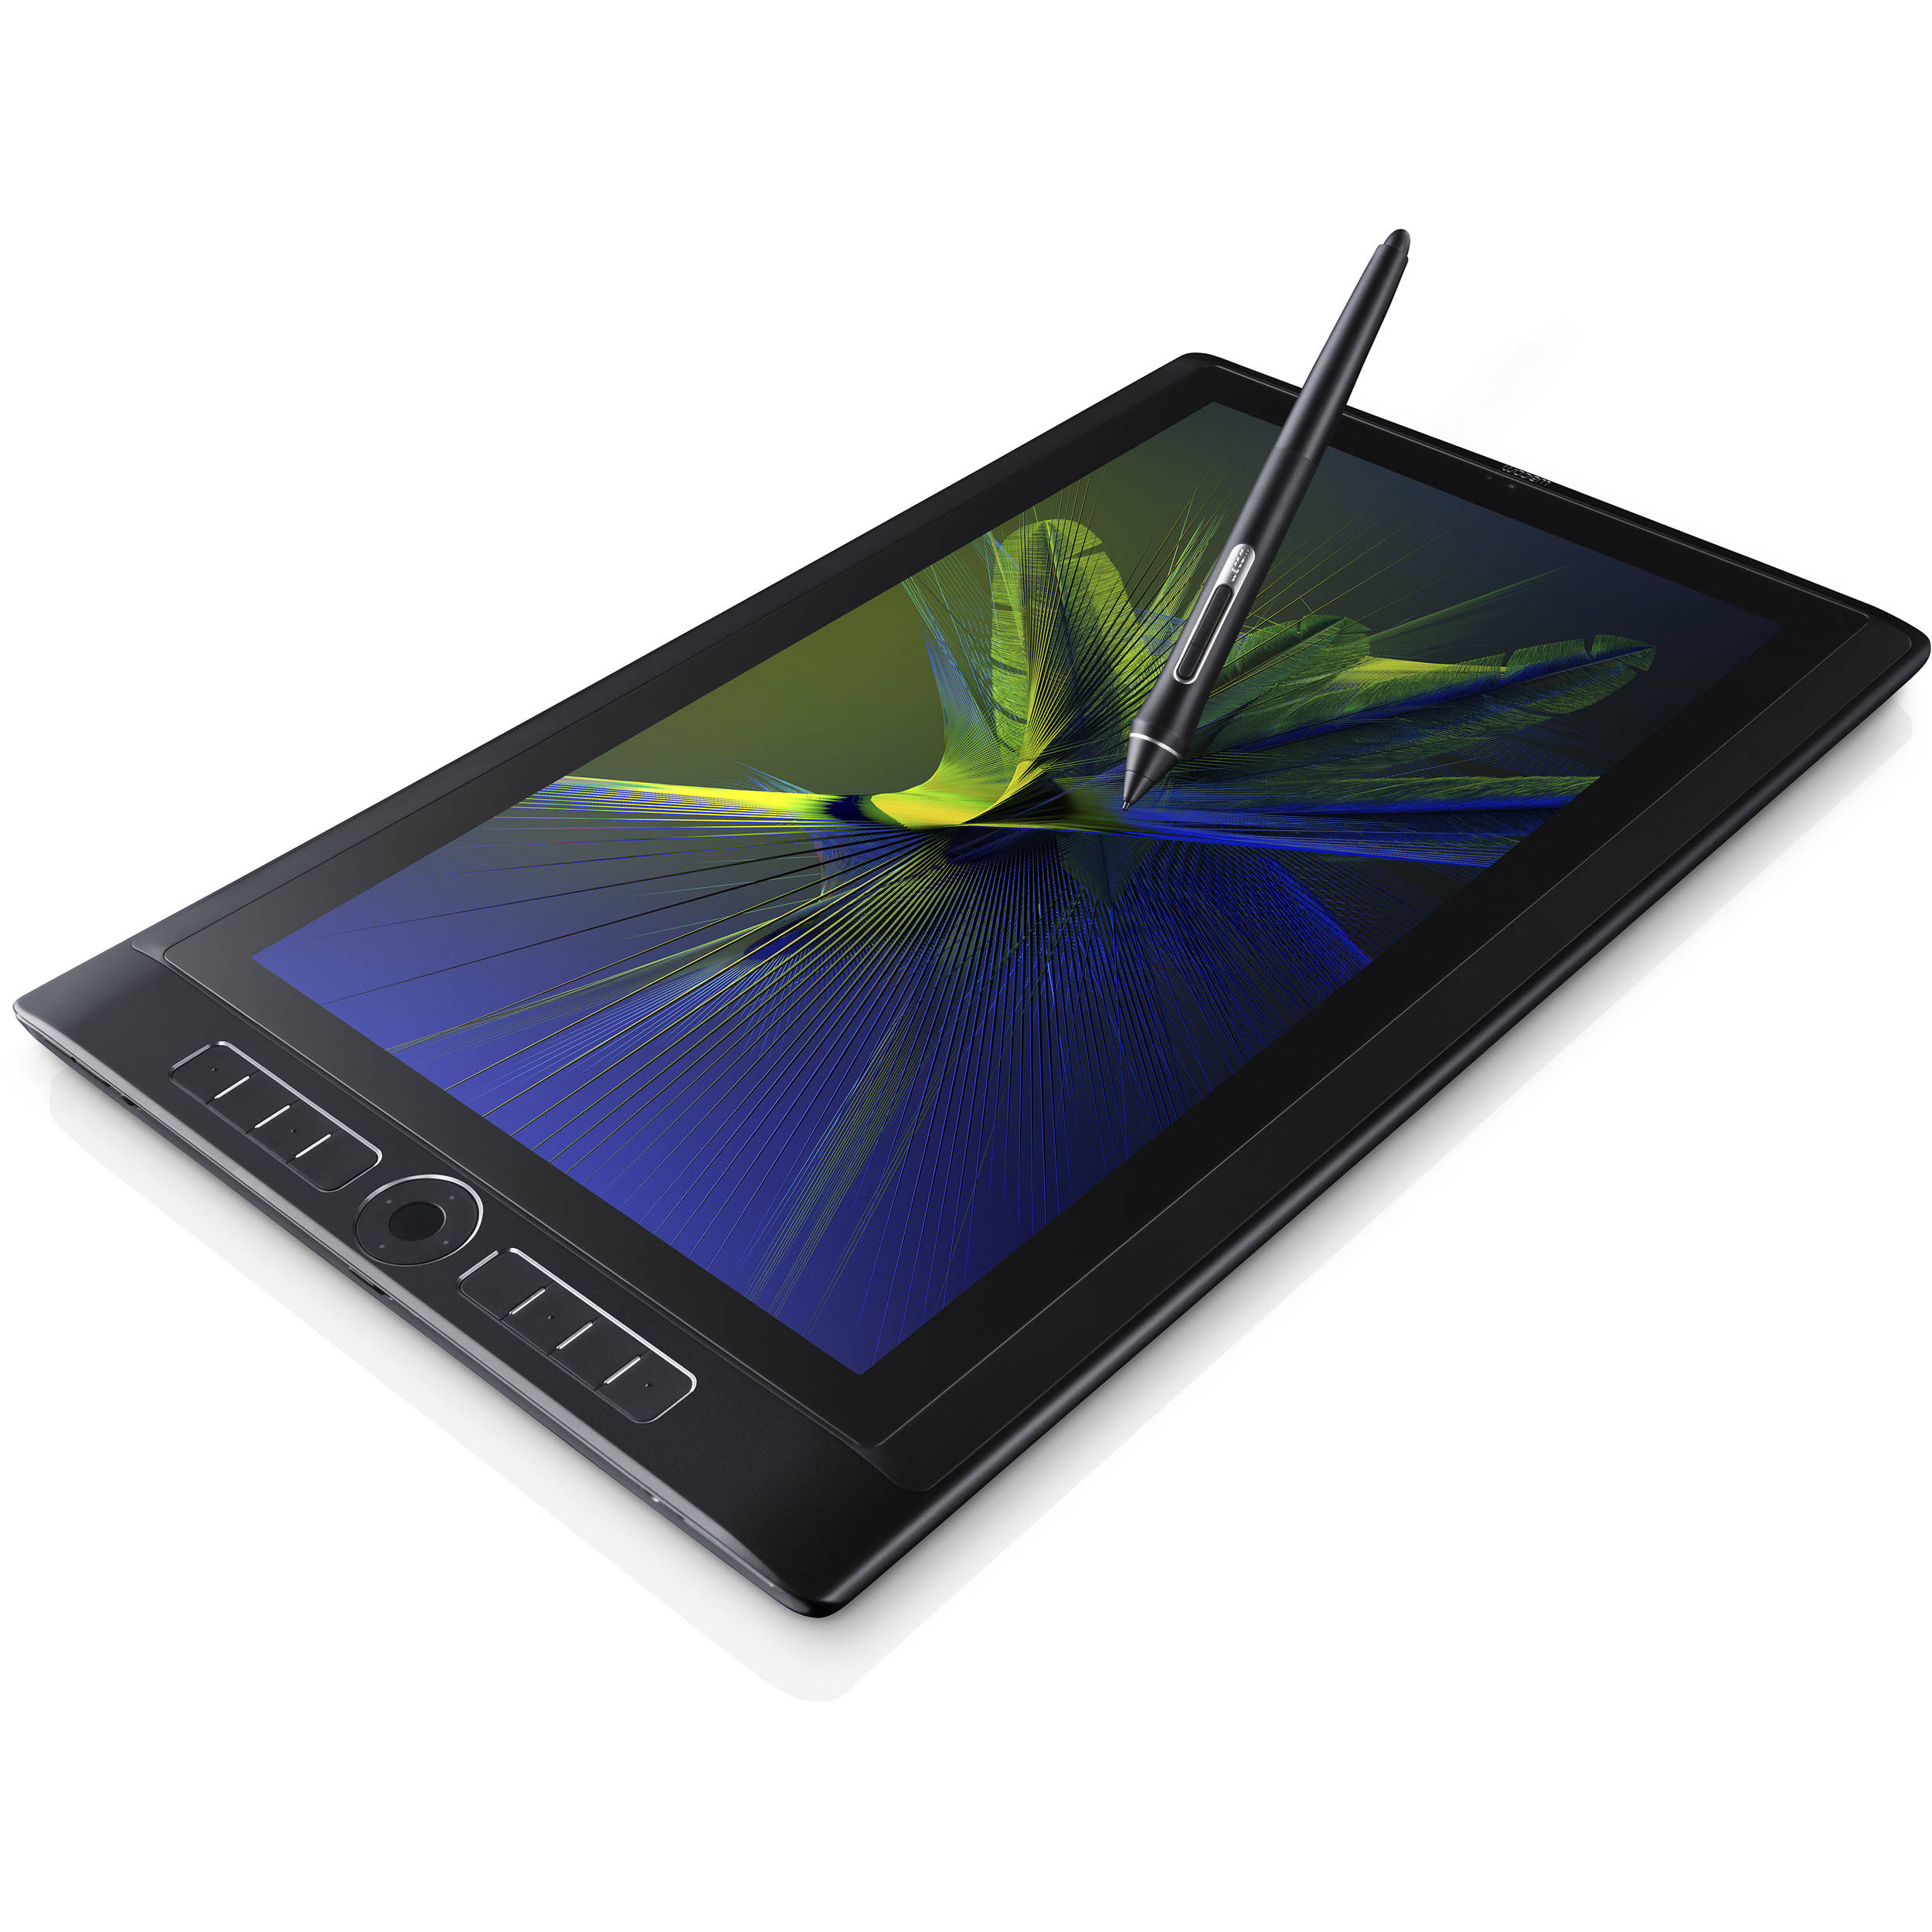 wacom 15 6 mobilestudio pro 16 graphics tablet dthw1620h. Black Bedroom Furniture Sets. Home Design Ideas